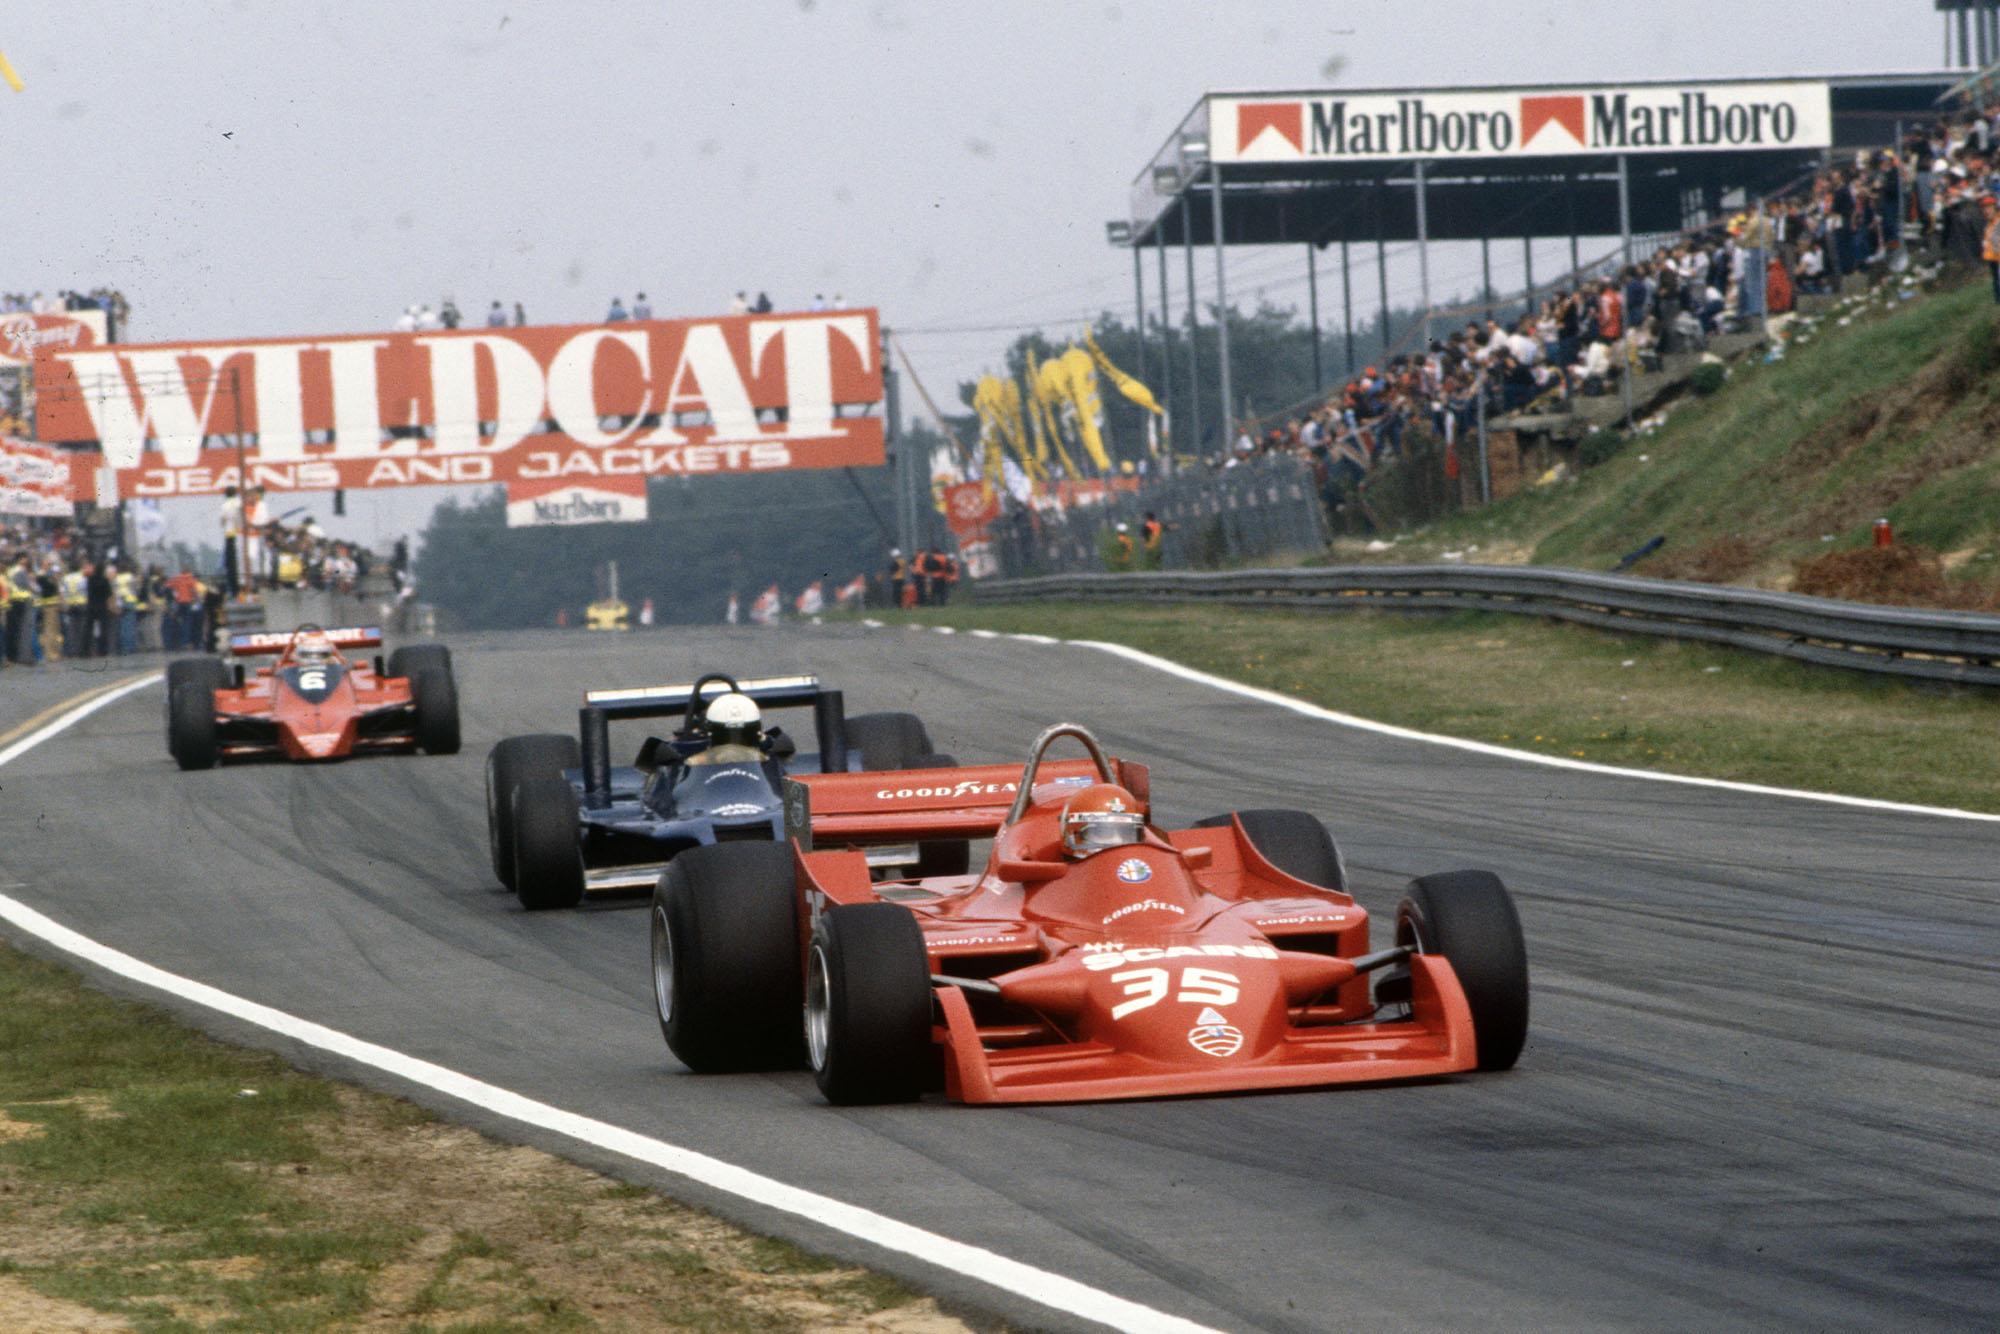 Alfa Romeo's Bruno Giacomelli competing at the 1979 Belgian Grand Prix, Zolder.